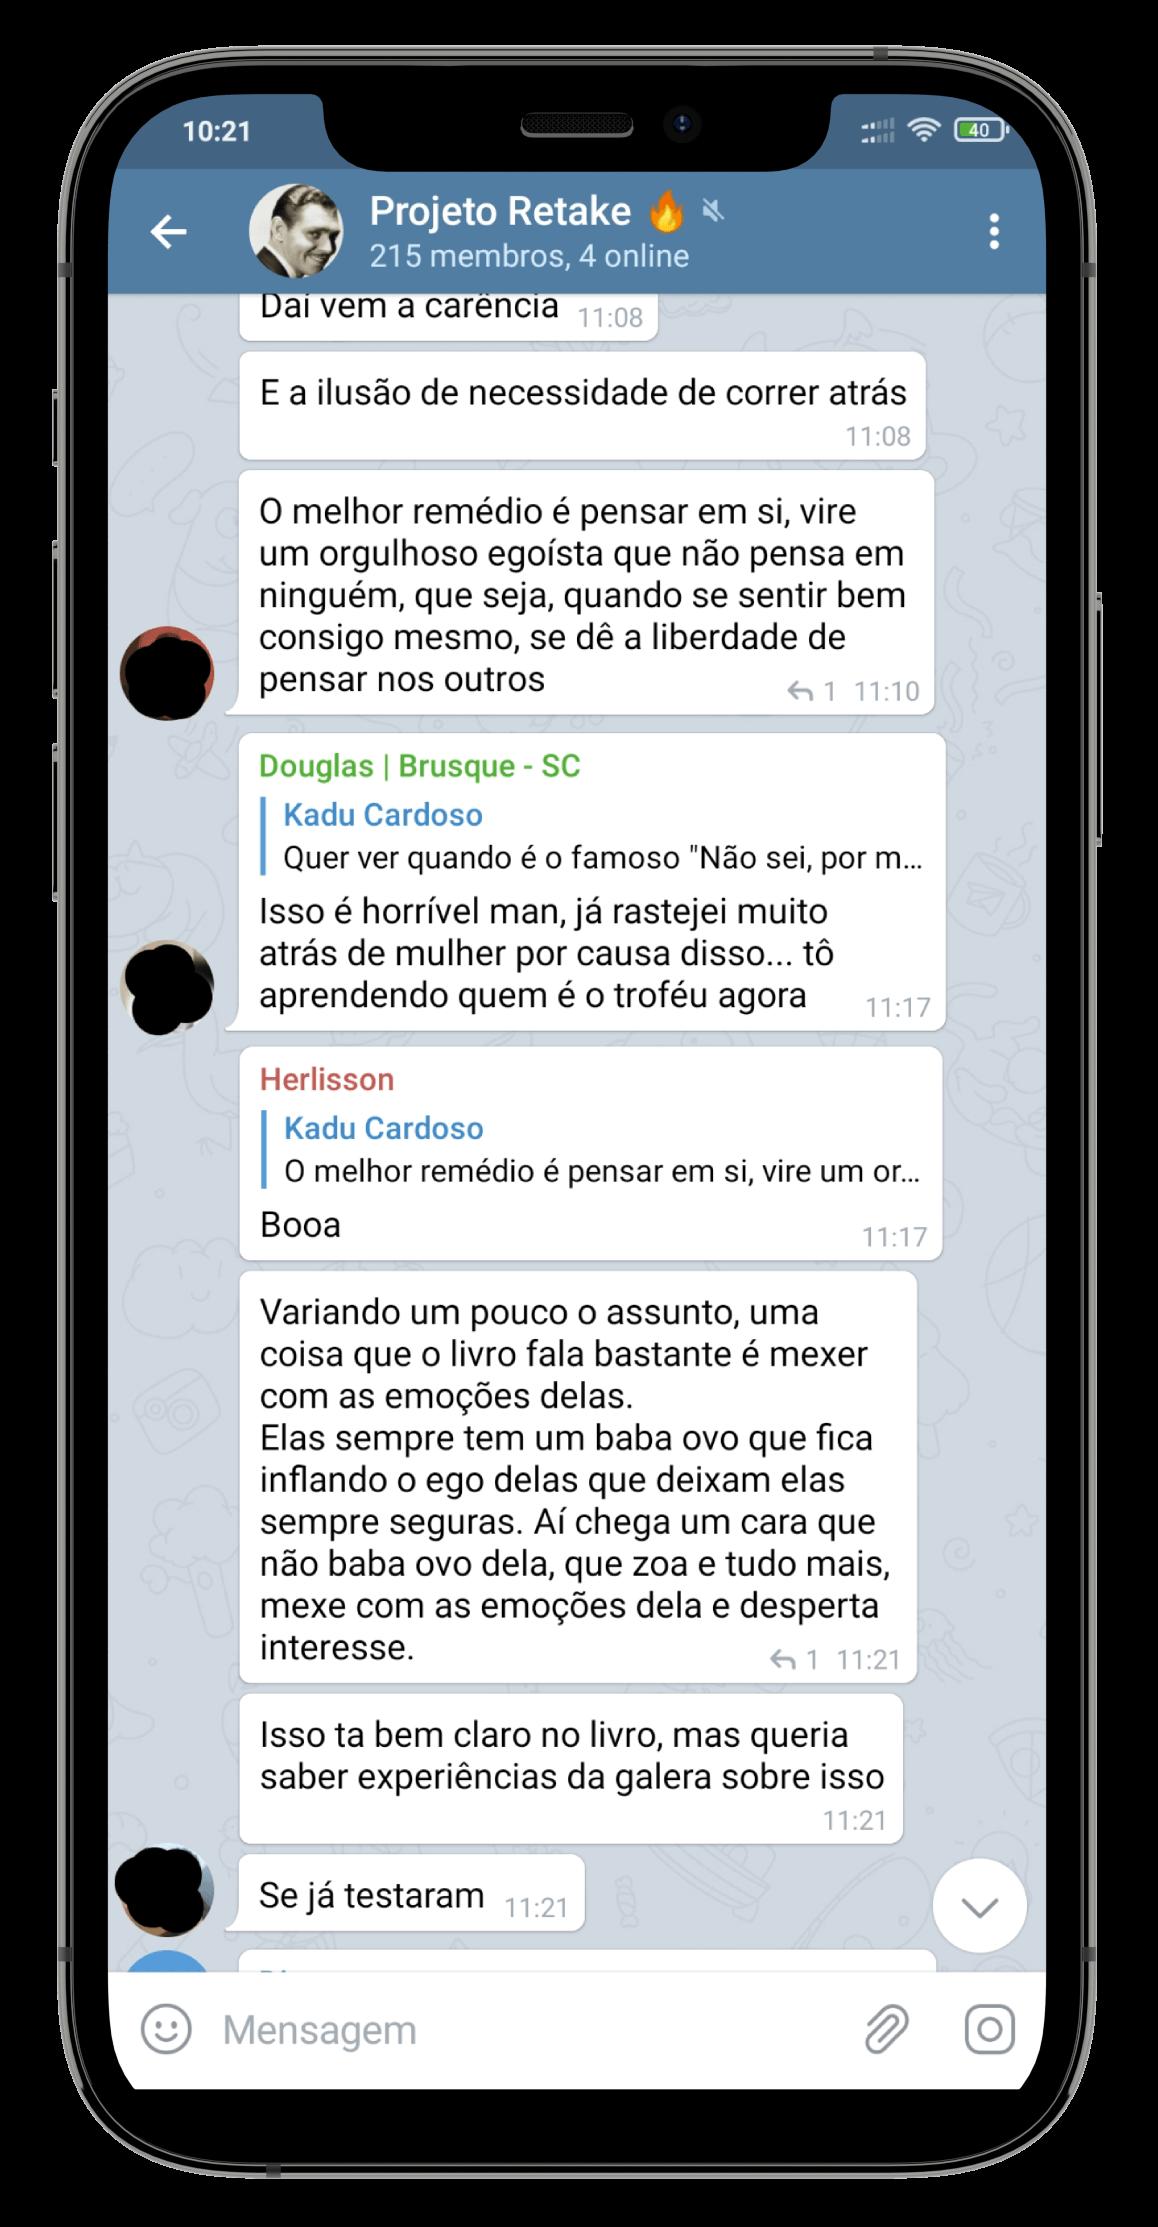 projeto-retake-telegram-3.png